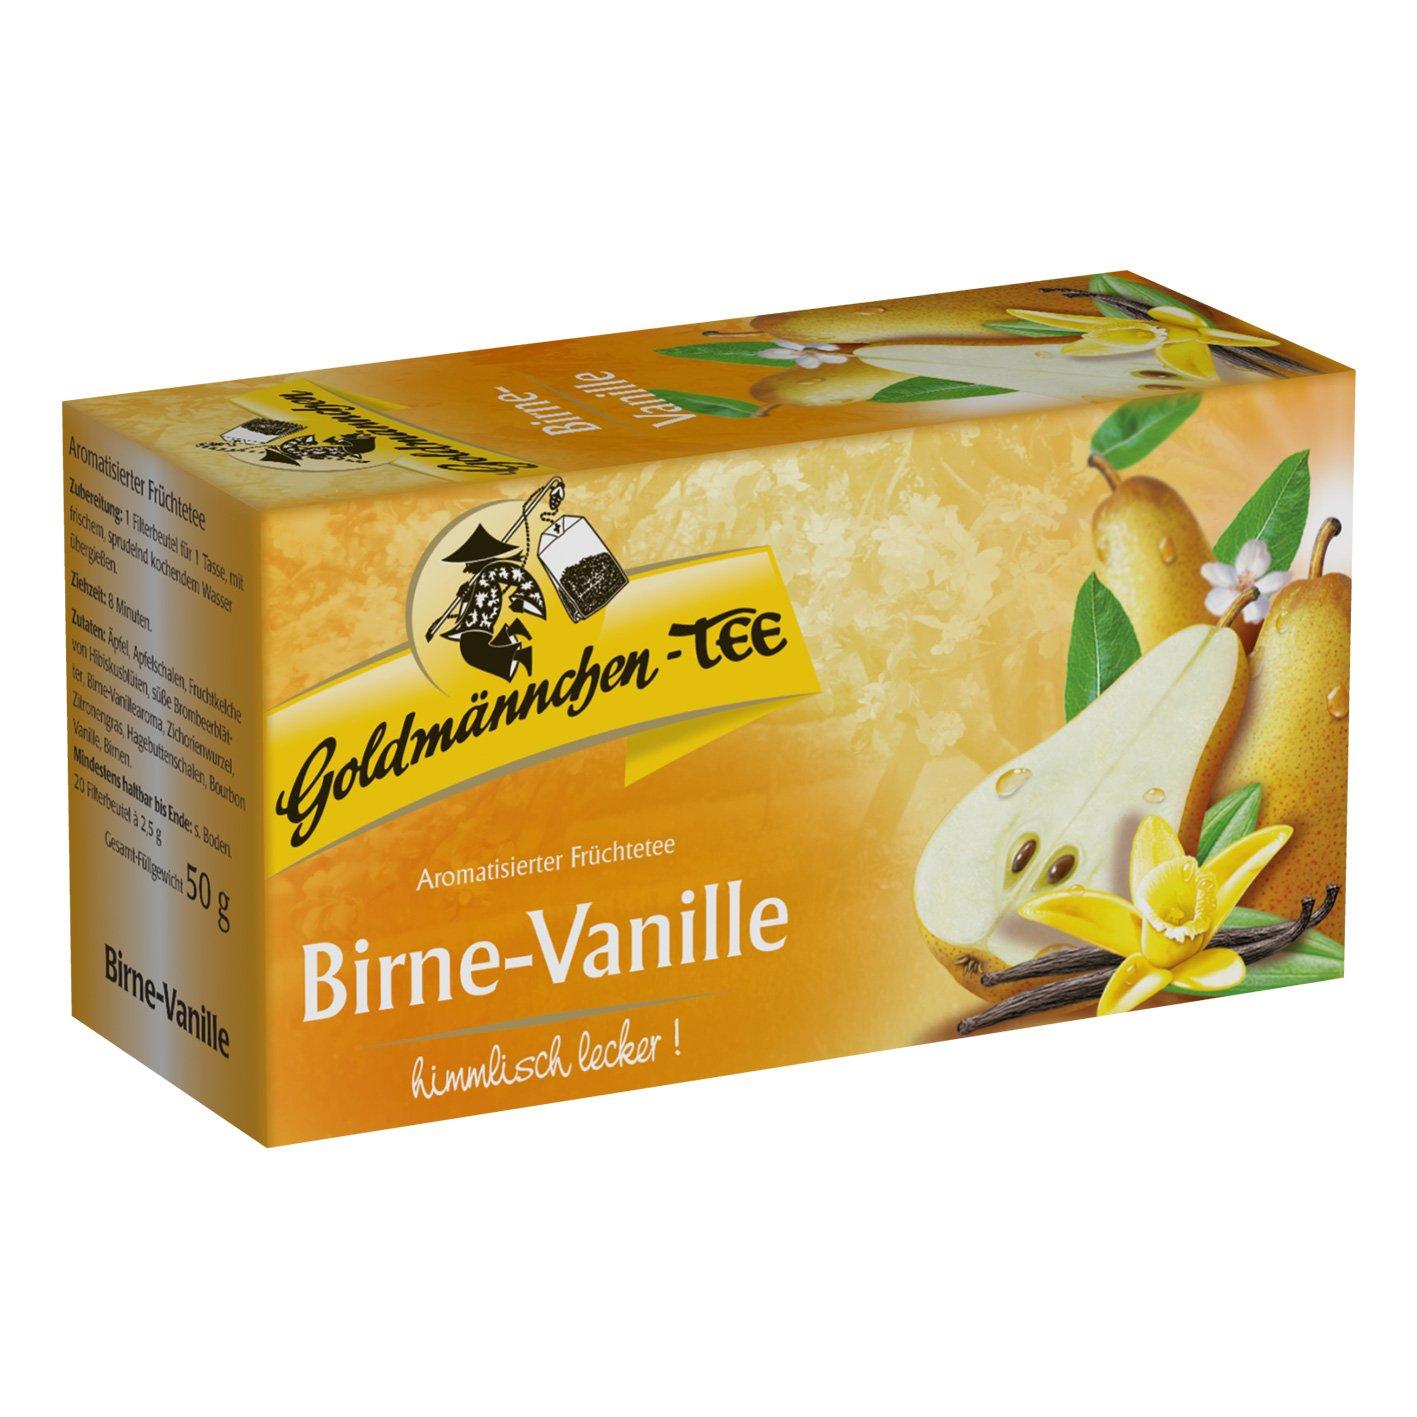 Goldmännchen Tee Birne Vanille